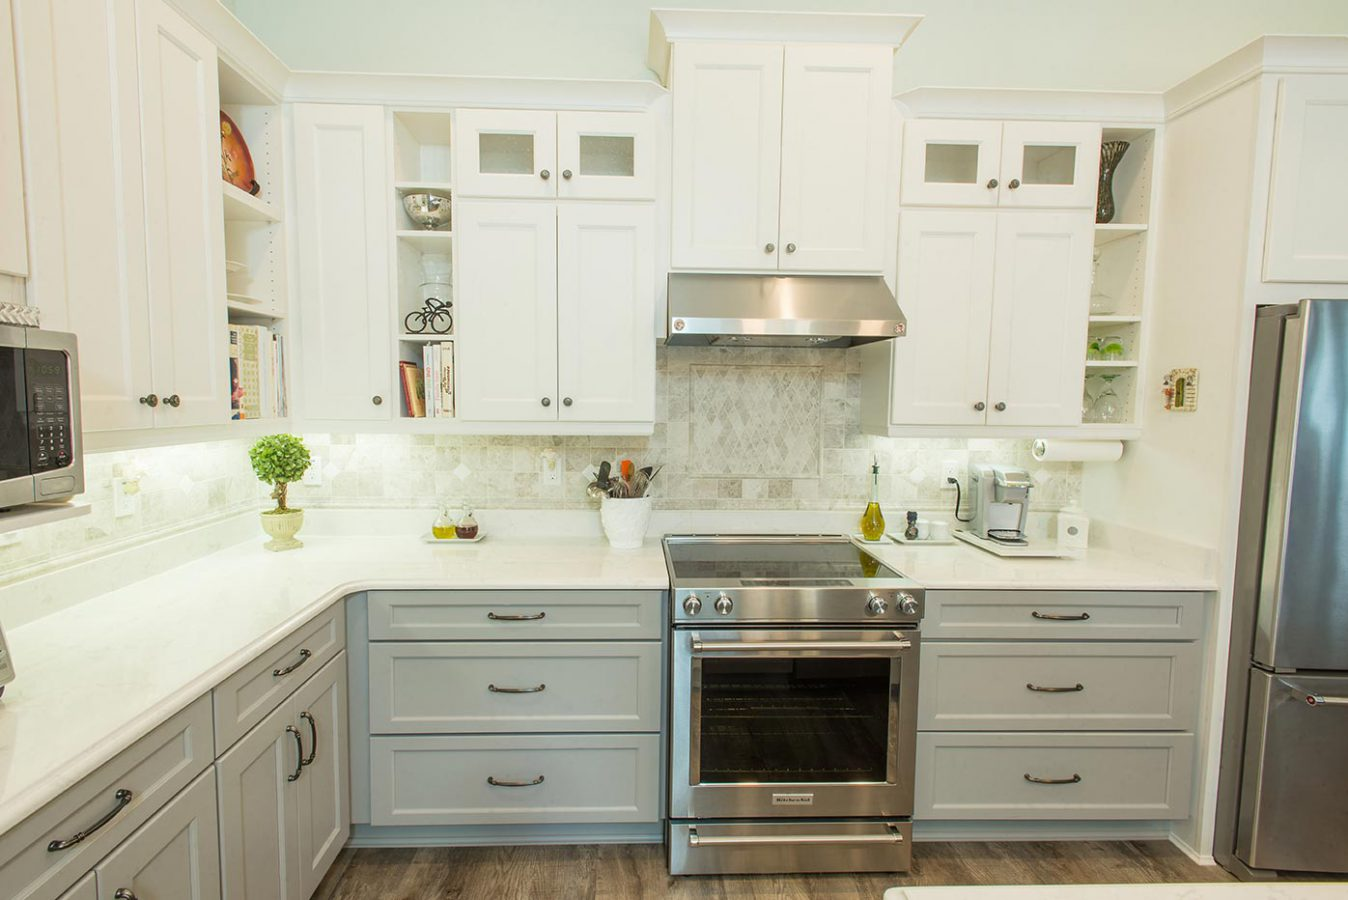 5 Kitchen Design Elements We Love Triple Crown Homes